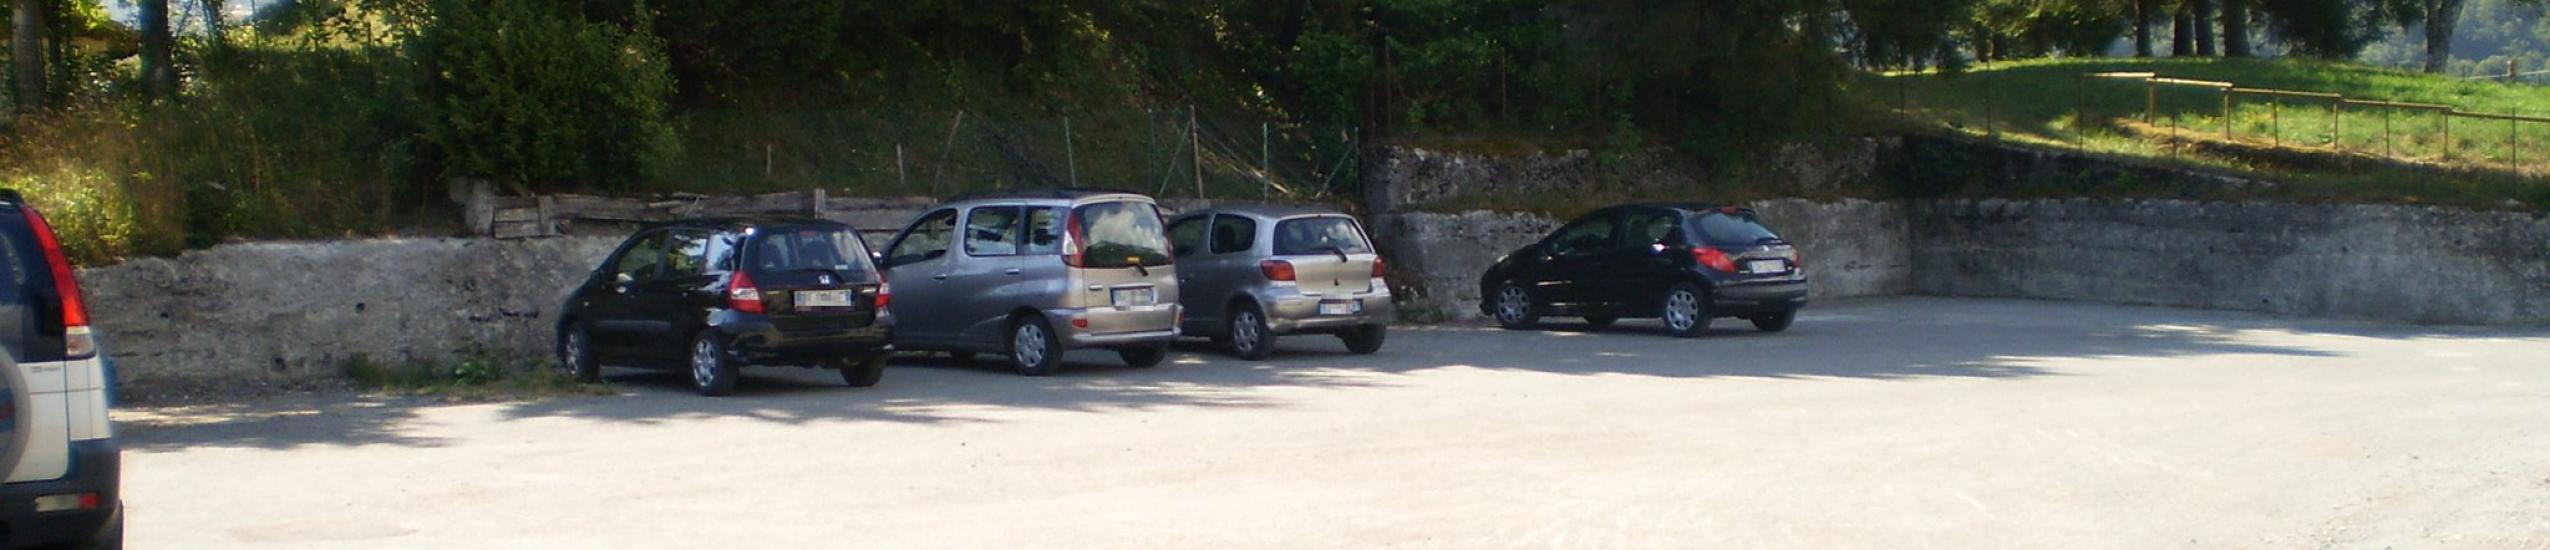 Parcheggio pubblico Esola